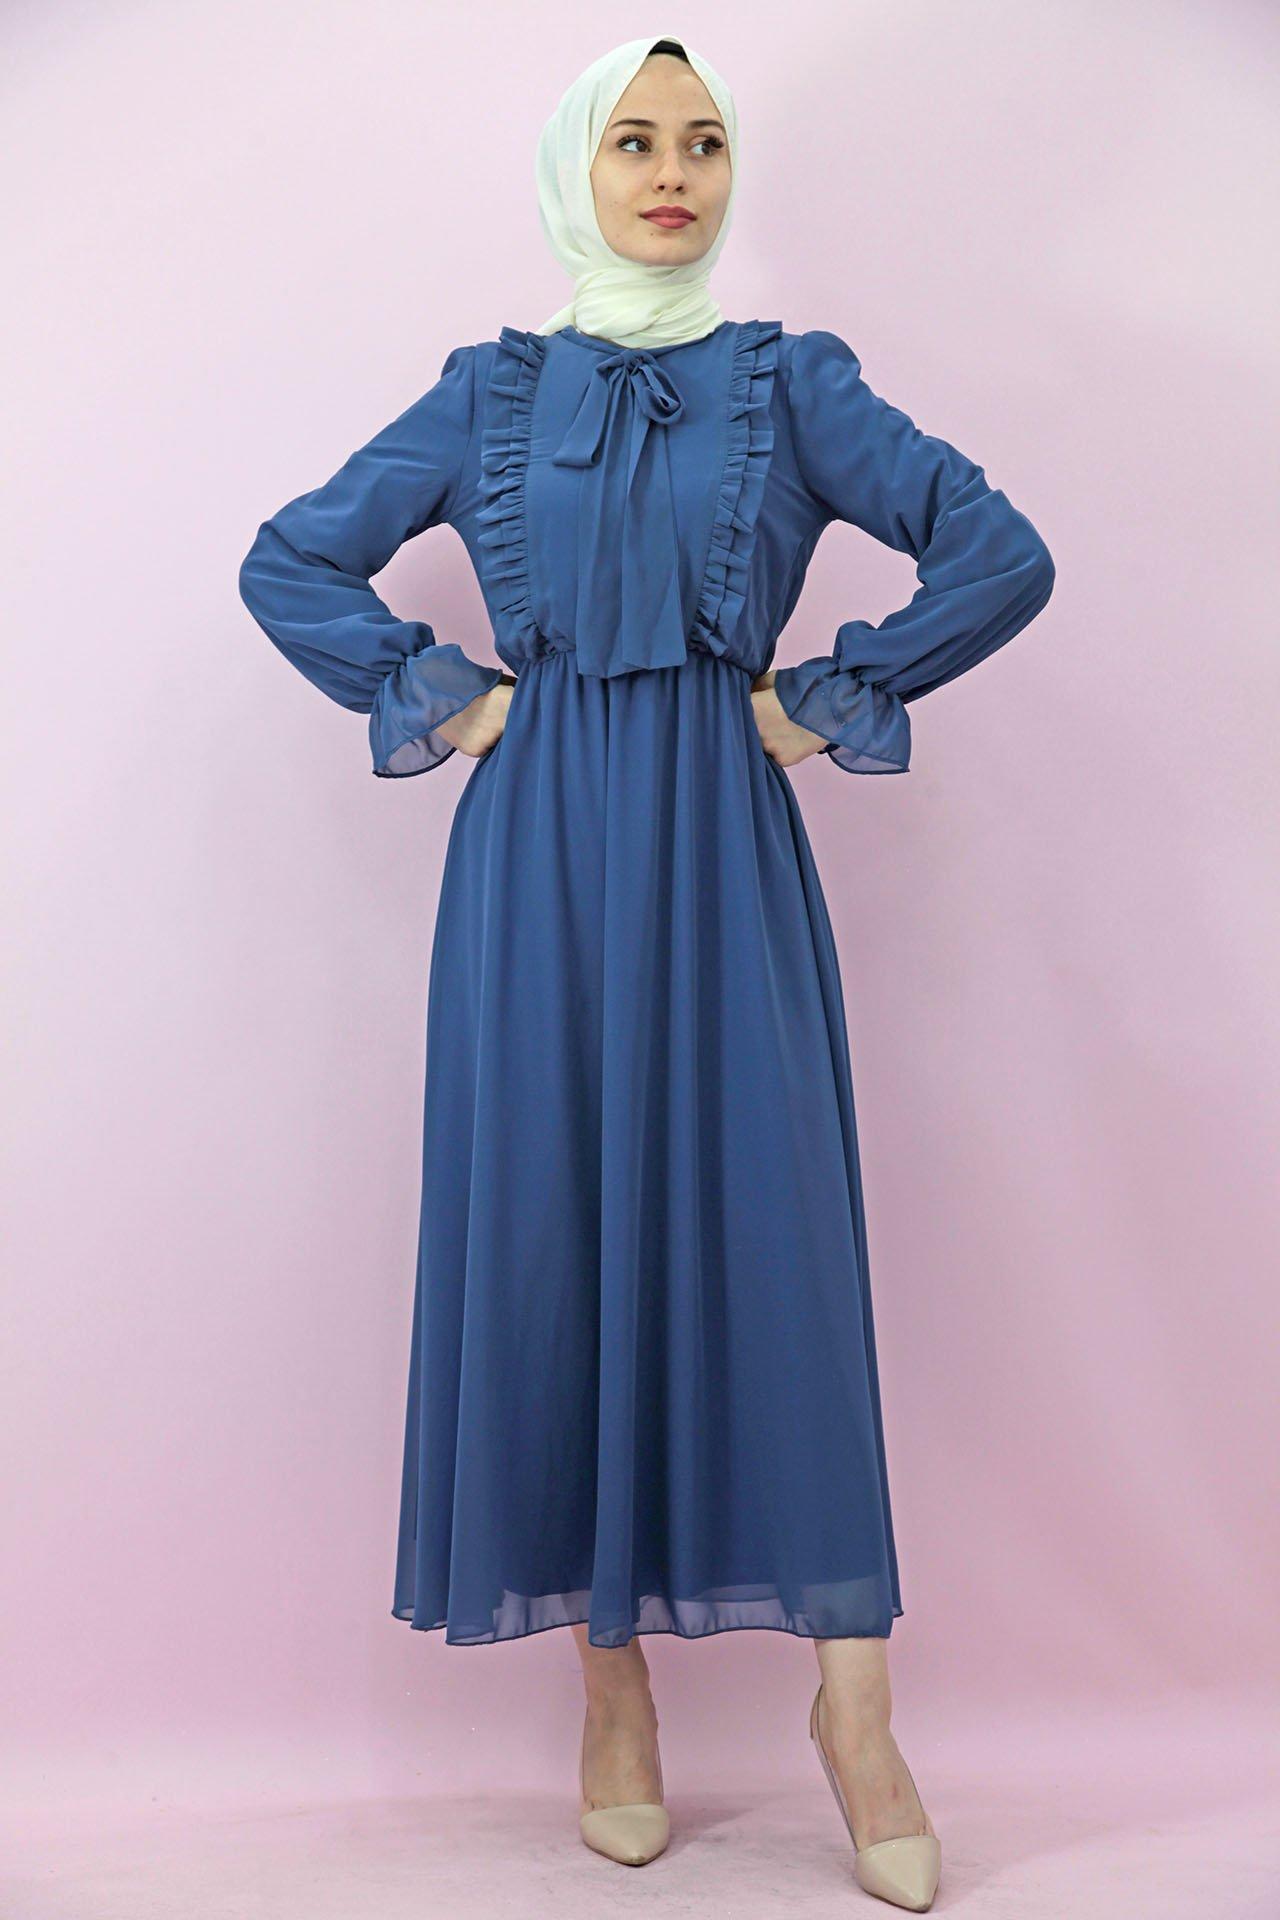 GİZAGİYİM - Giza Beli Lastikli Fırfırlı Elbise İndigo